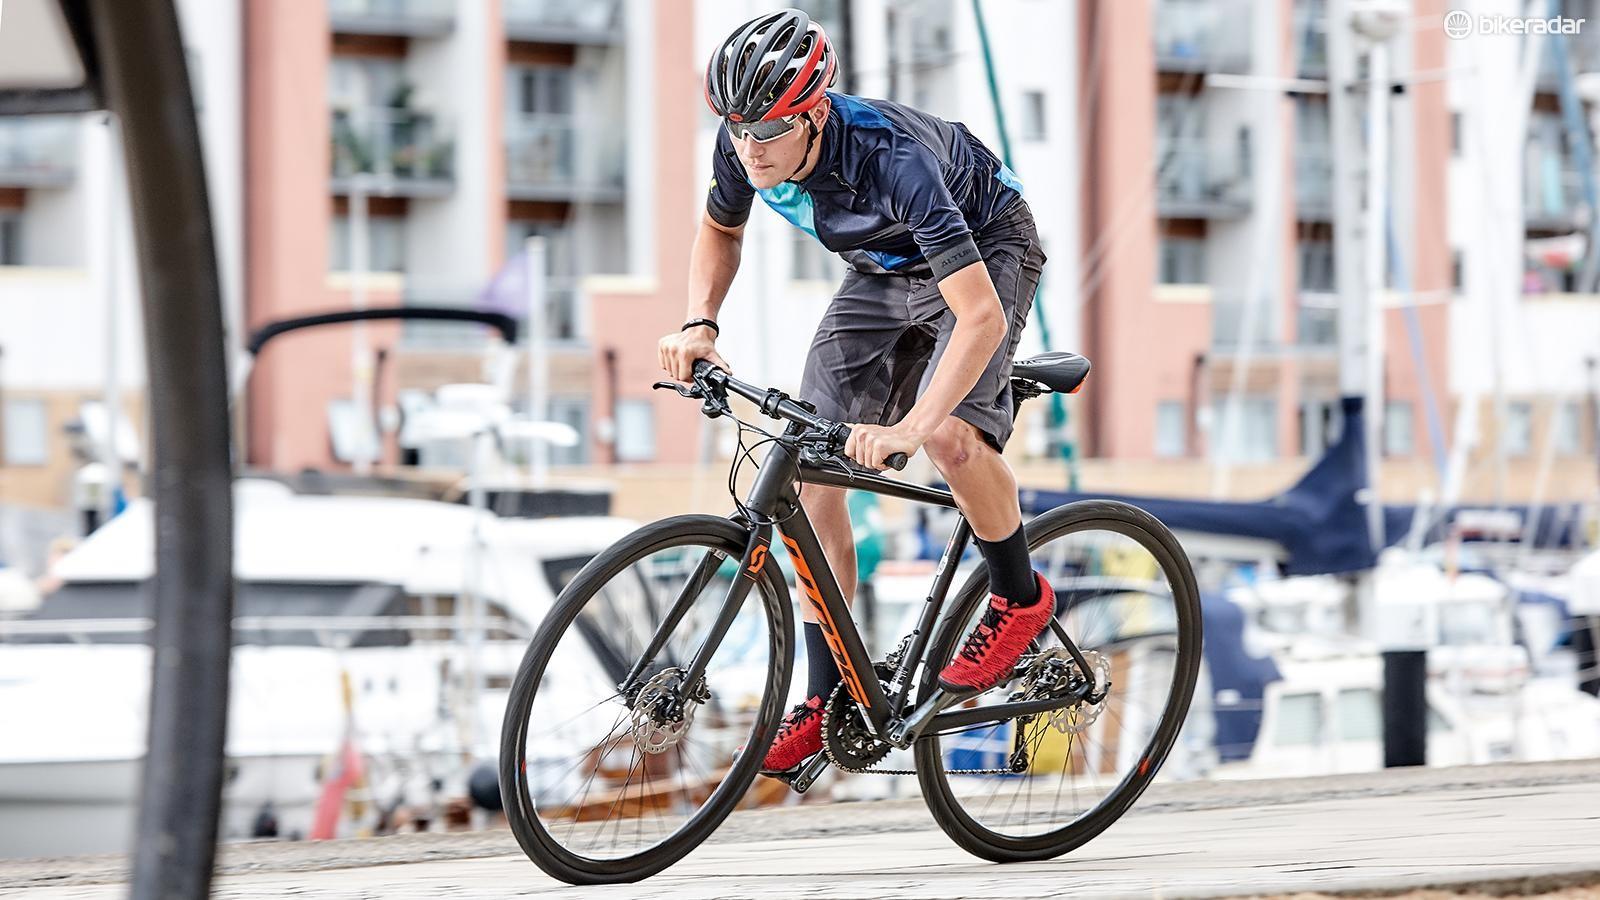 a45d9aeedd5 Scott Metrix 20 Disc review - Hybrid Bikes - Bikes - BikeRadar